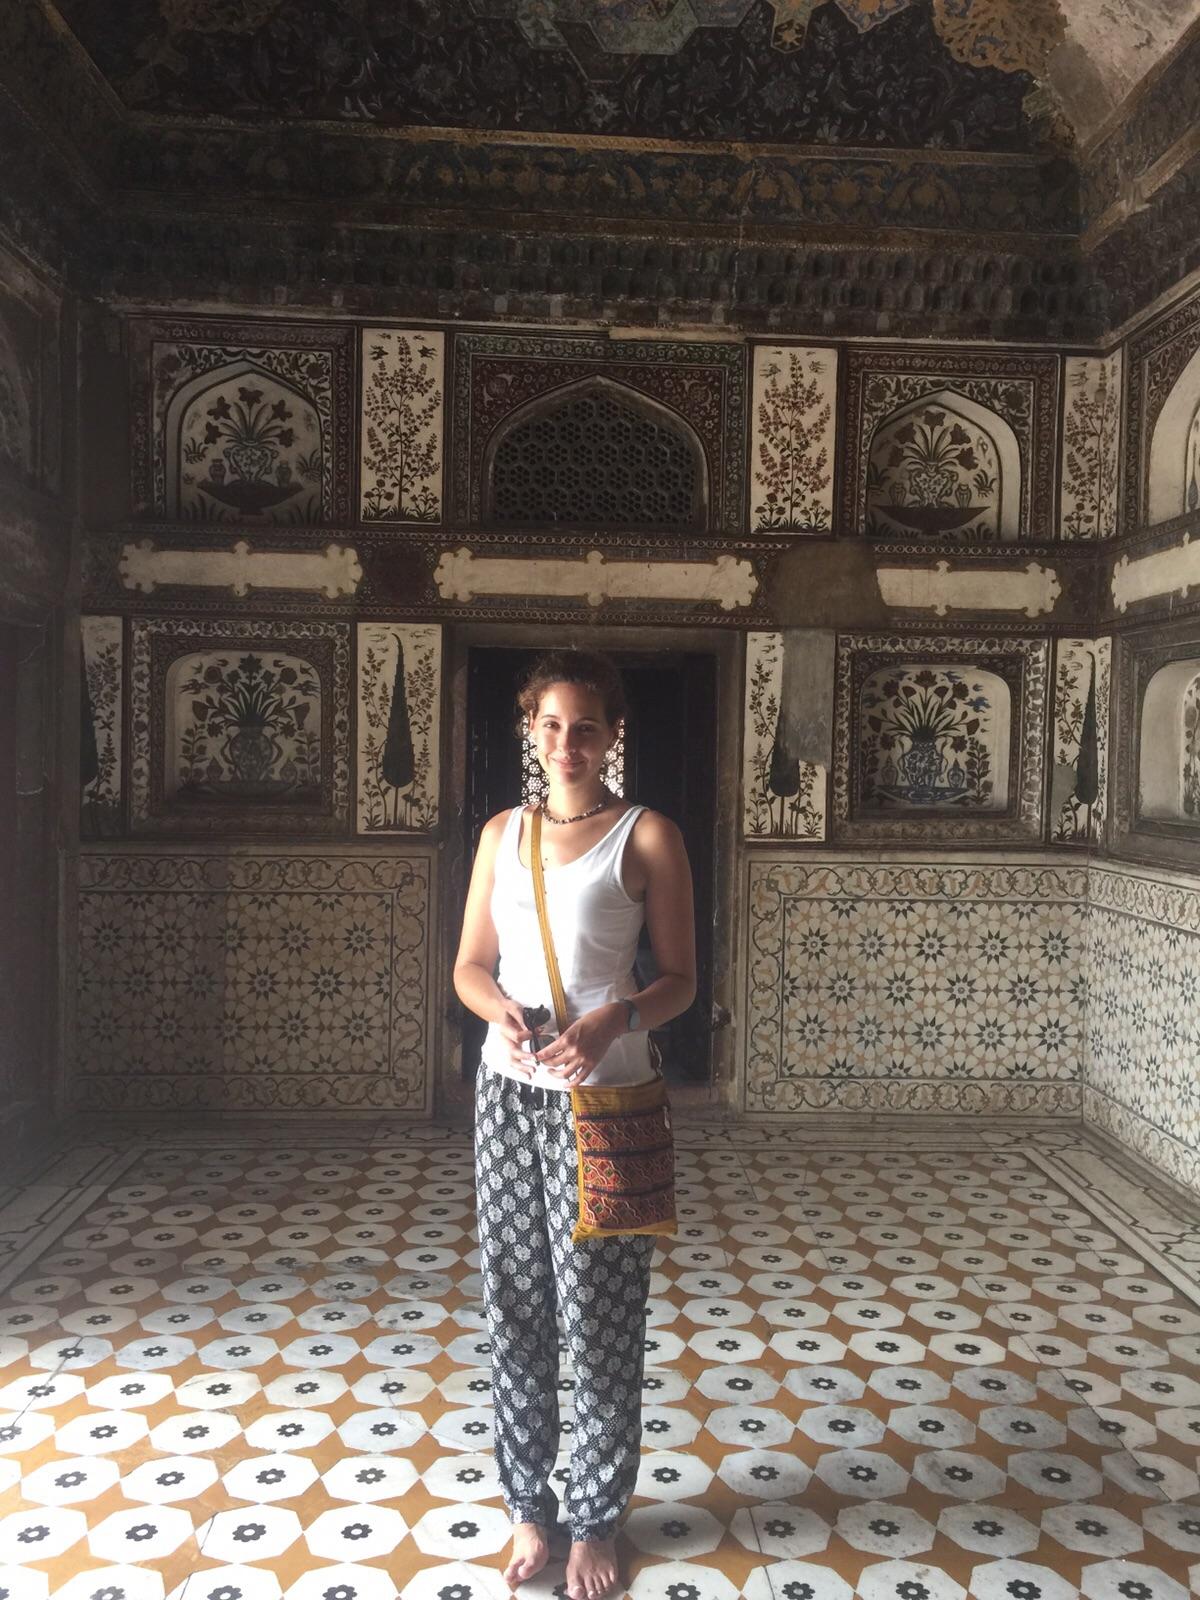 Inside Itimad-ud-Daulah´s Tomb